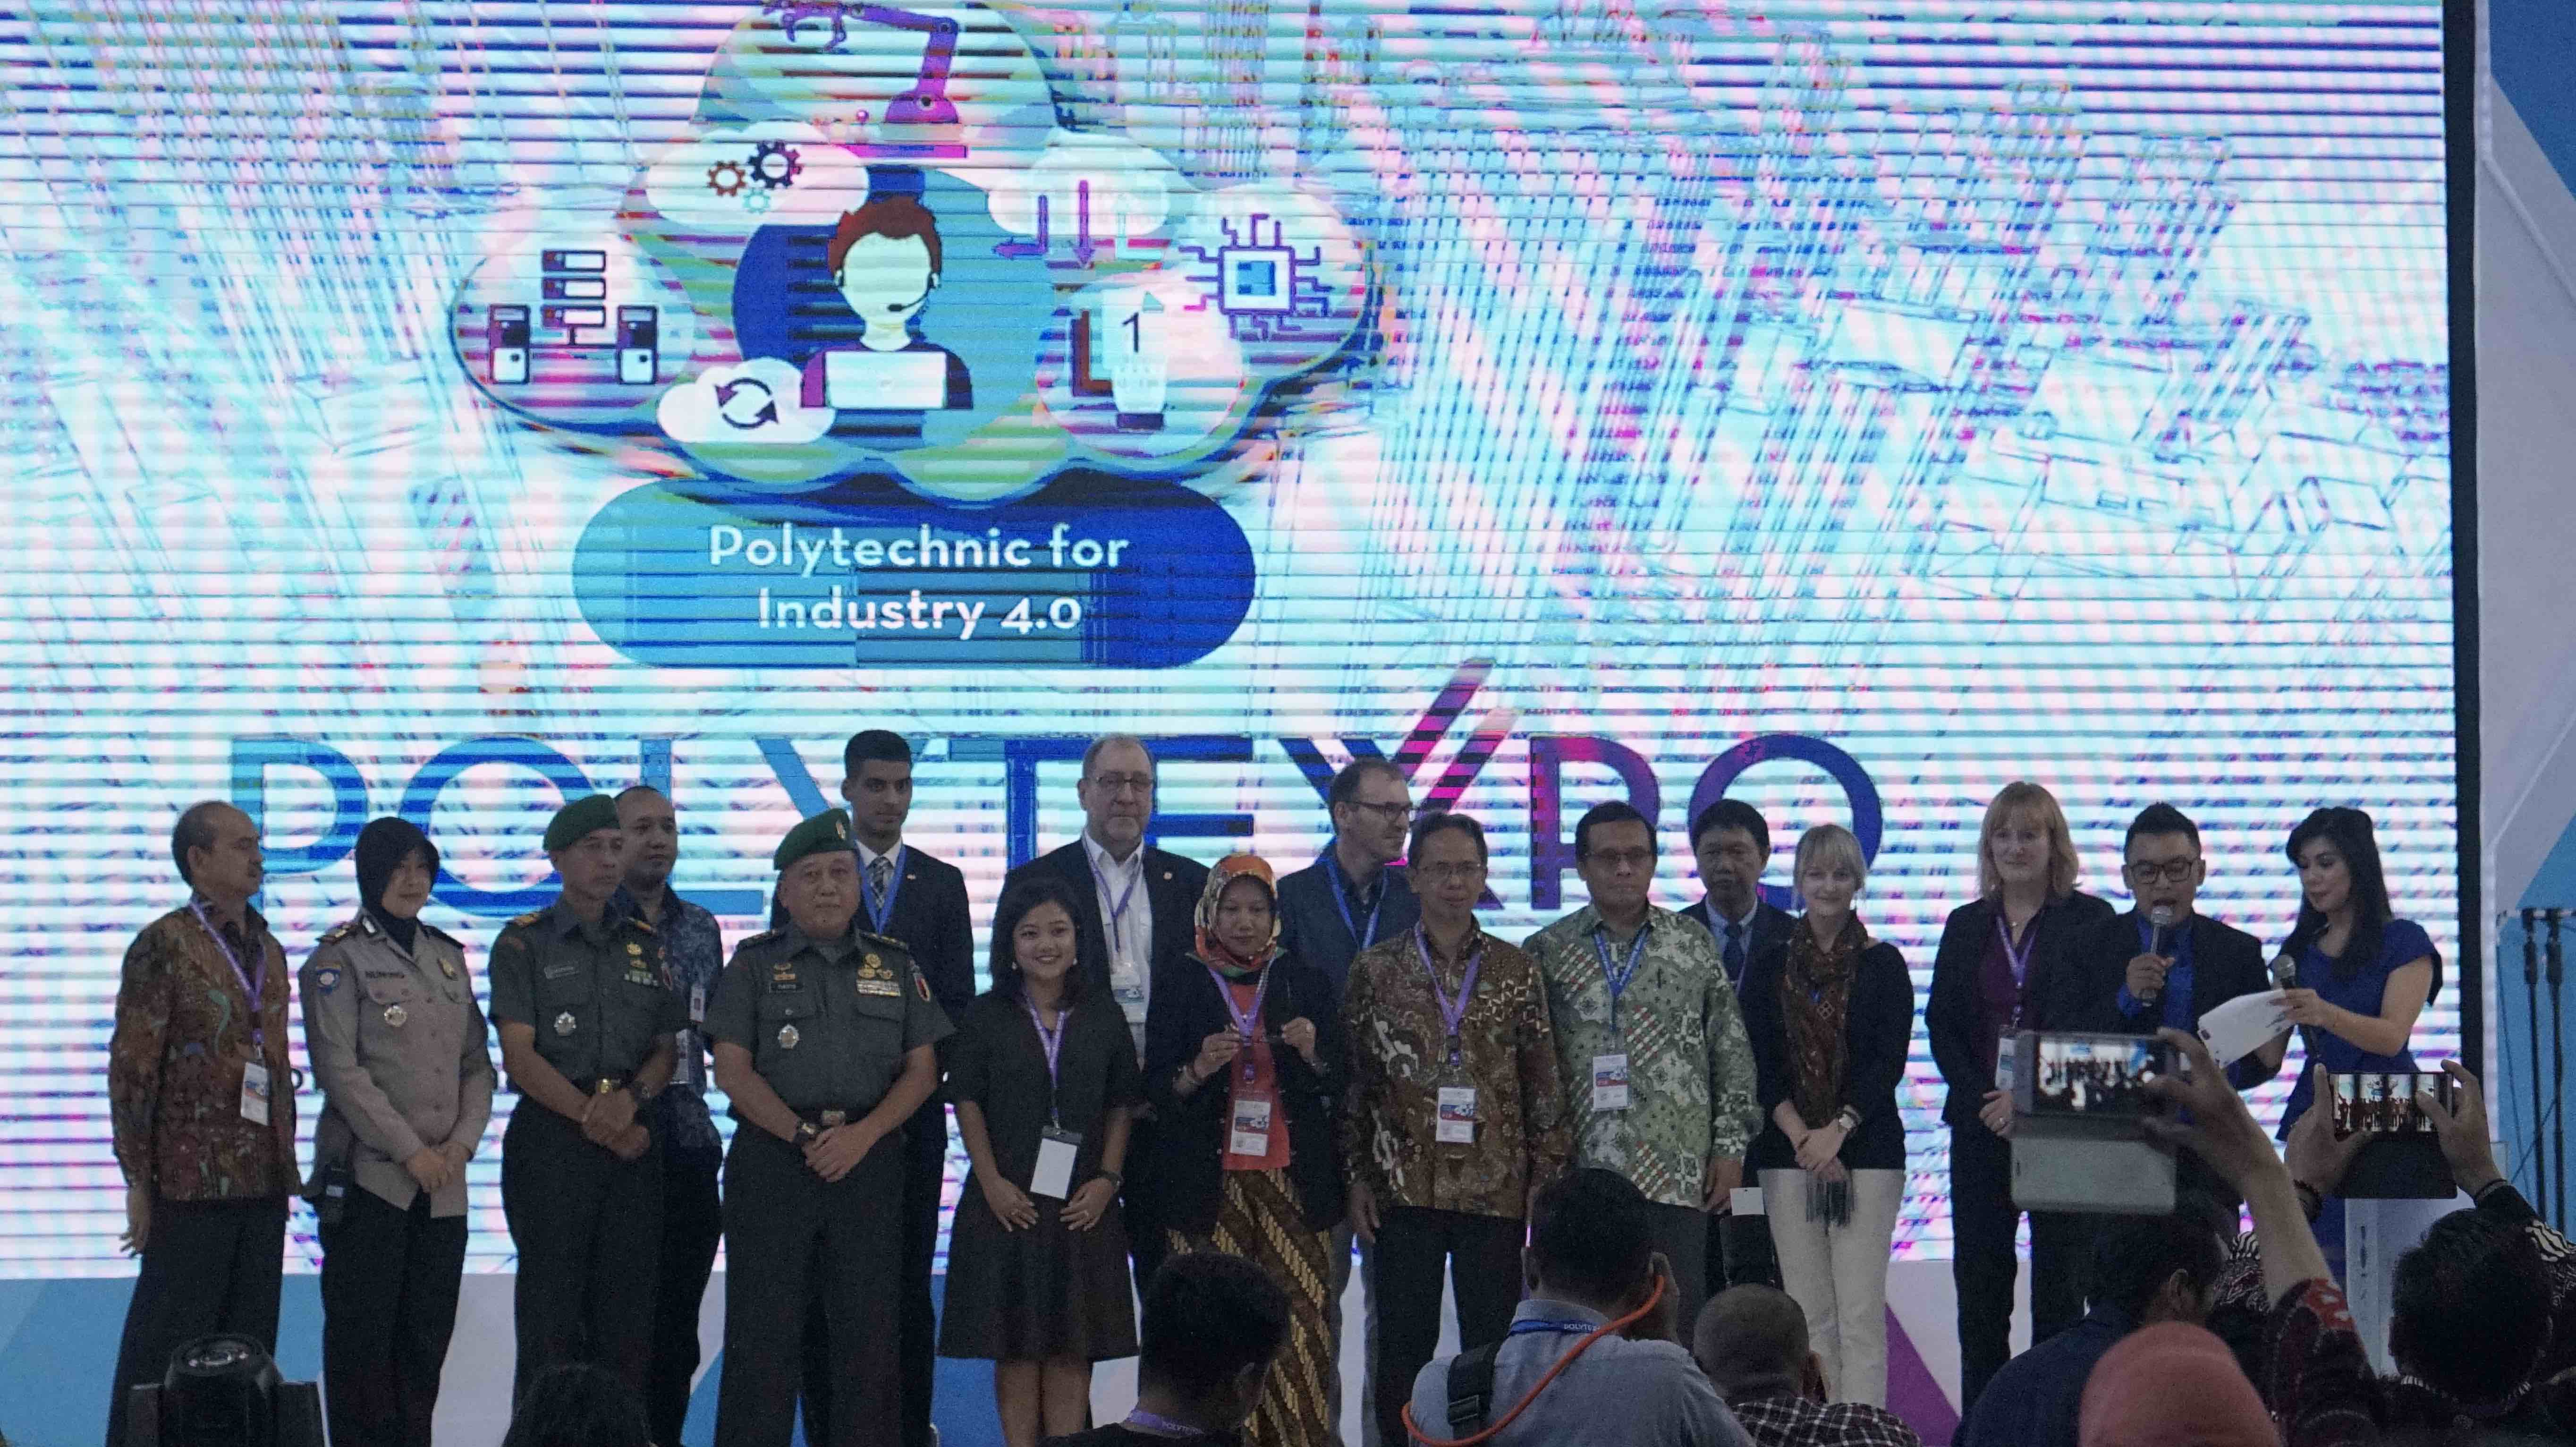 Politeknik Indonesia, Siap Jadi Motor Industri 4.0